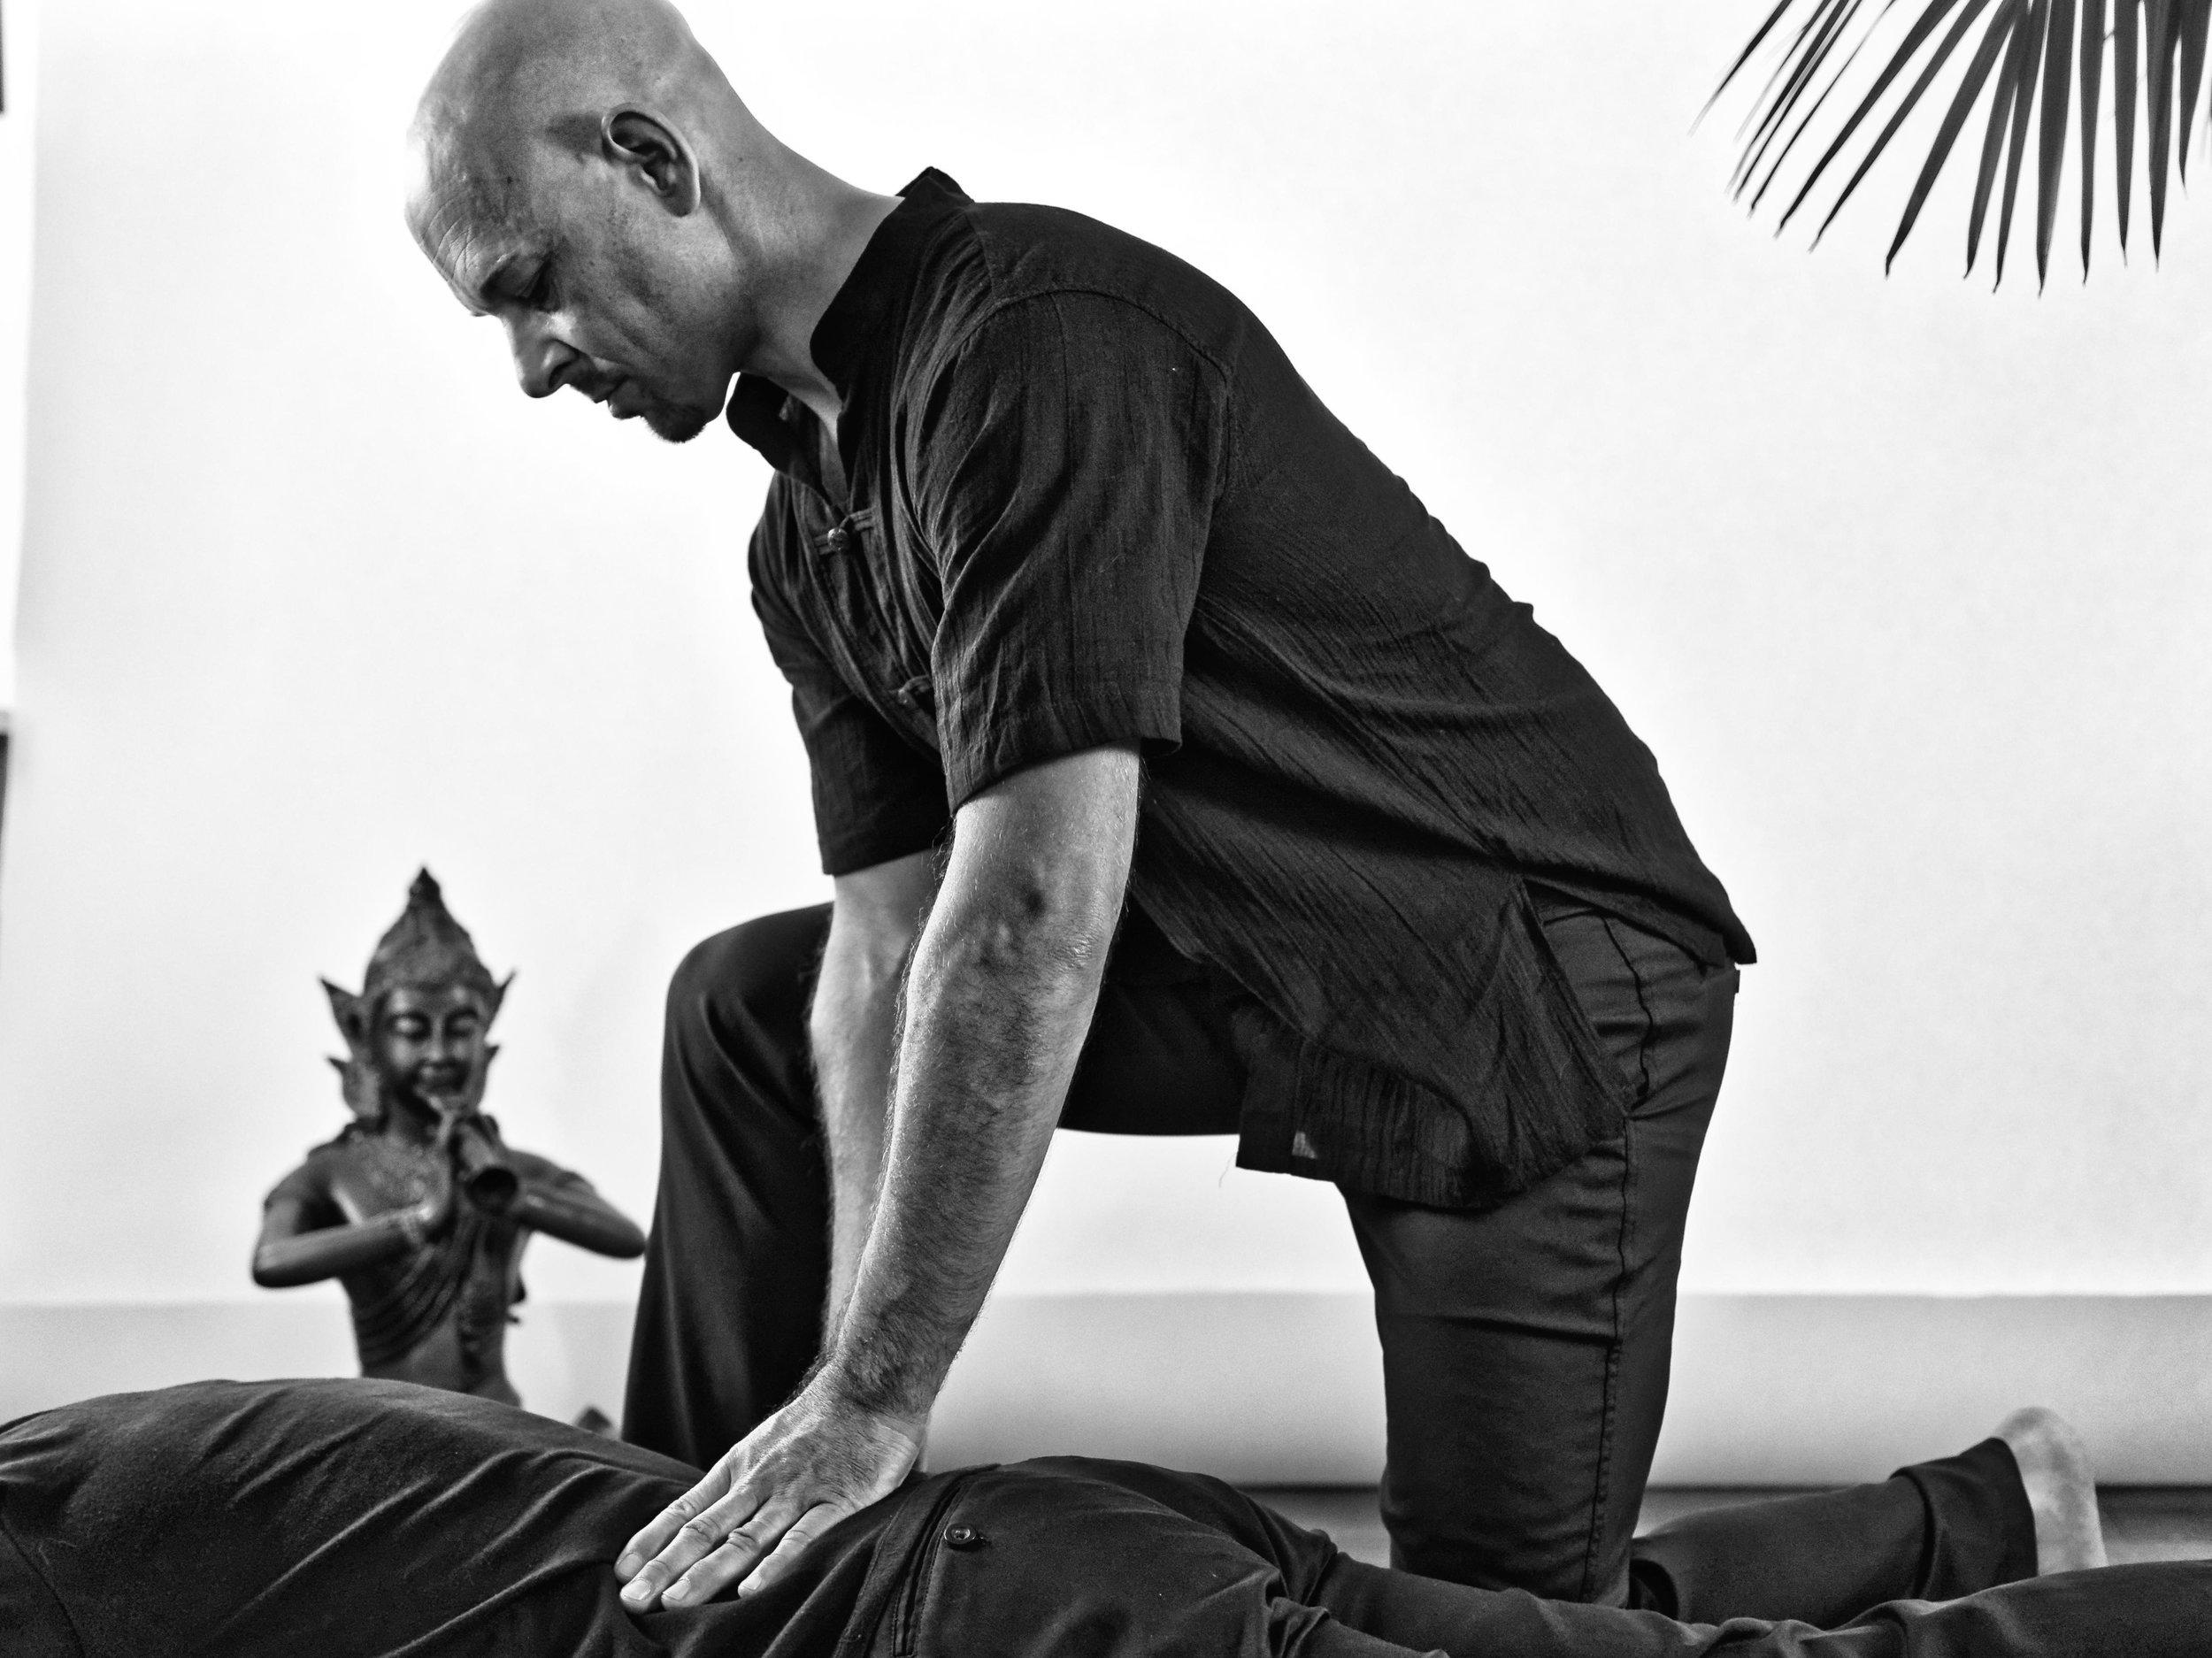 Douleurs musculo -squelettiques . vital shiatsu Arles 13